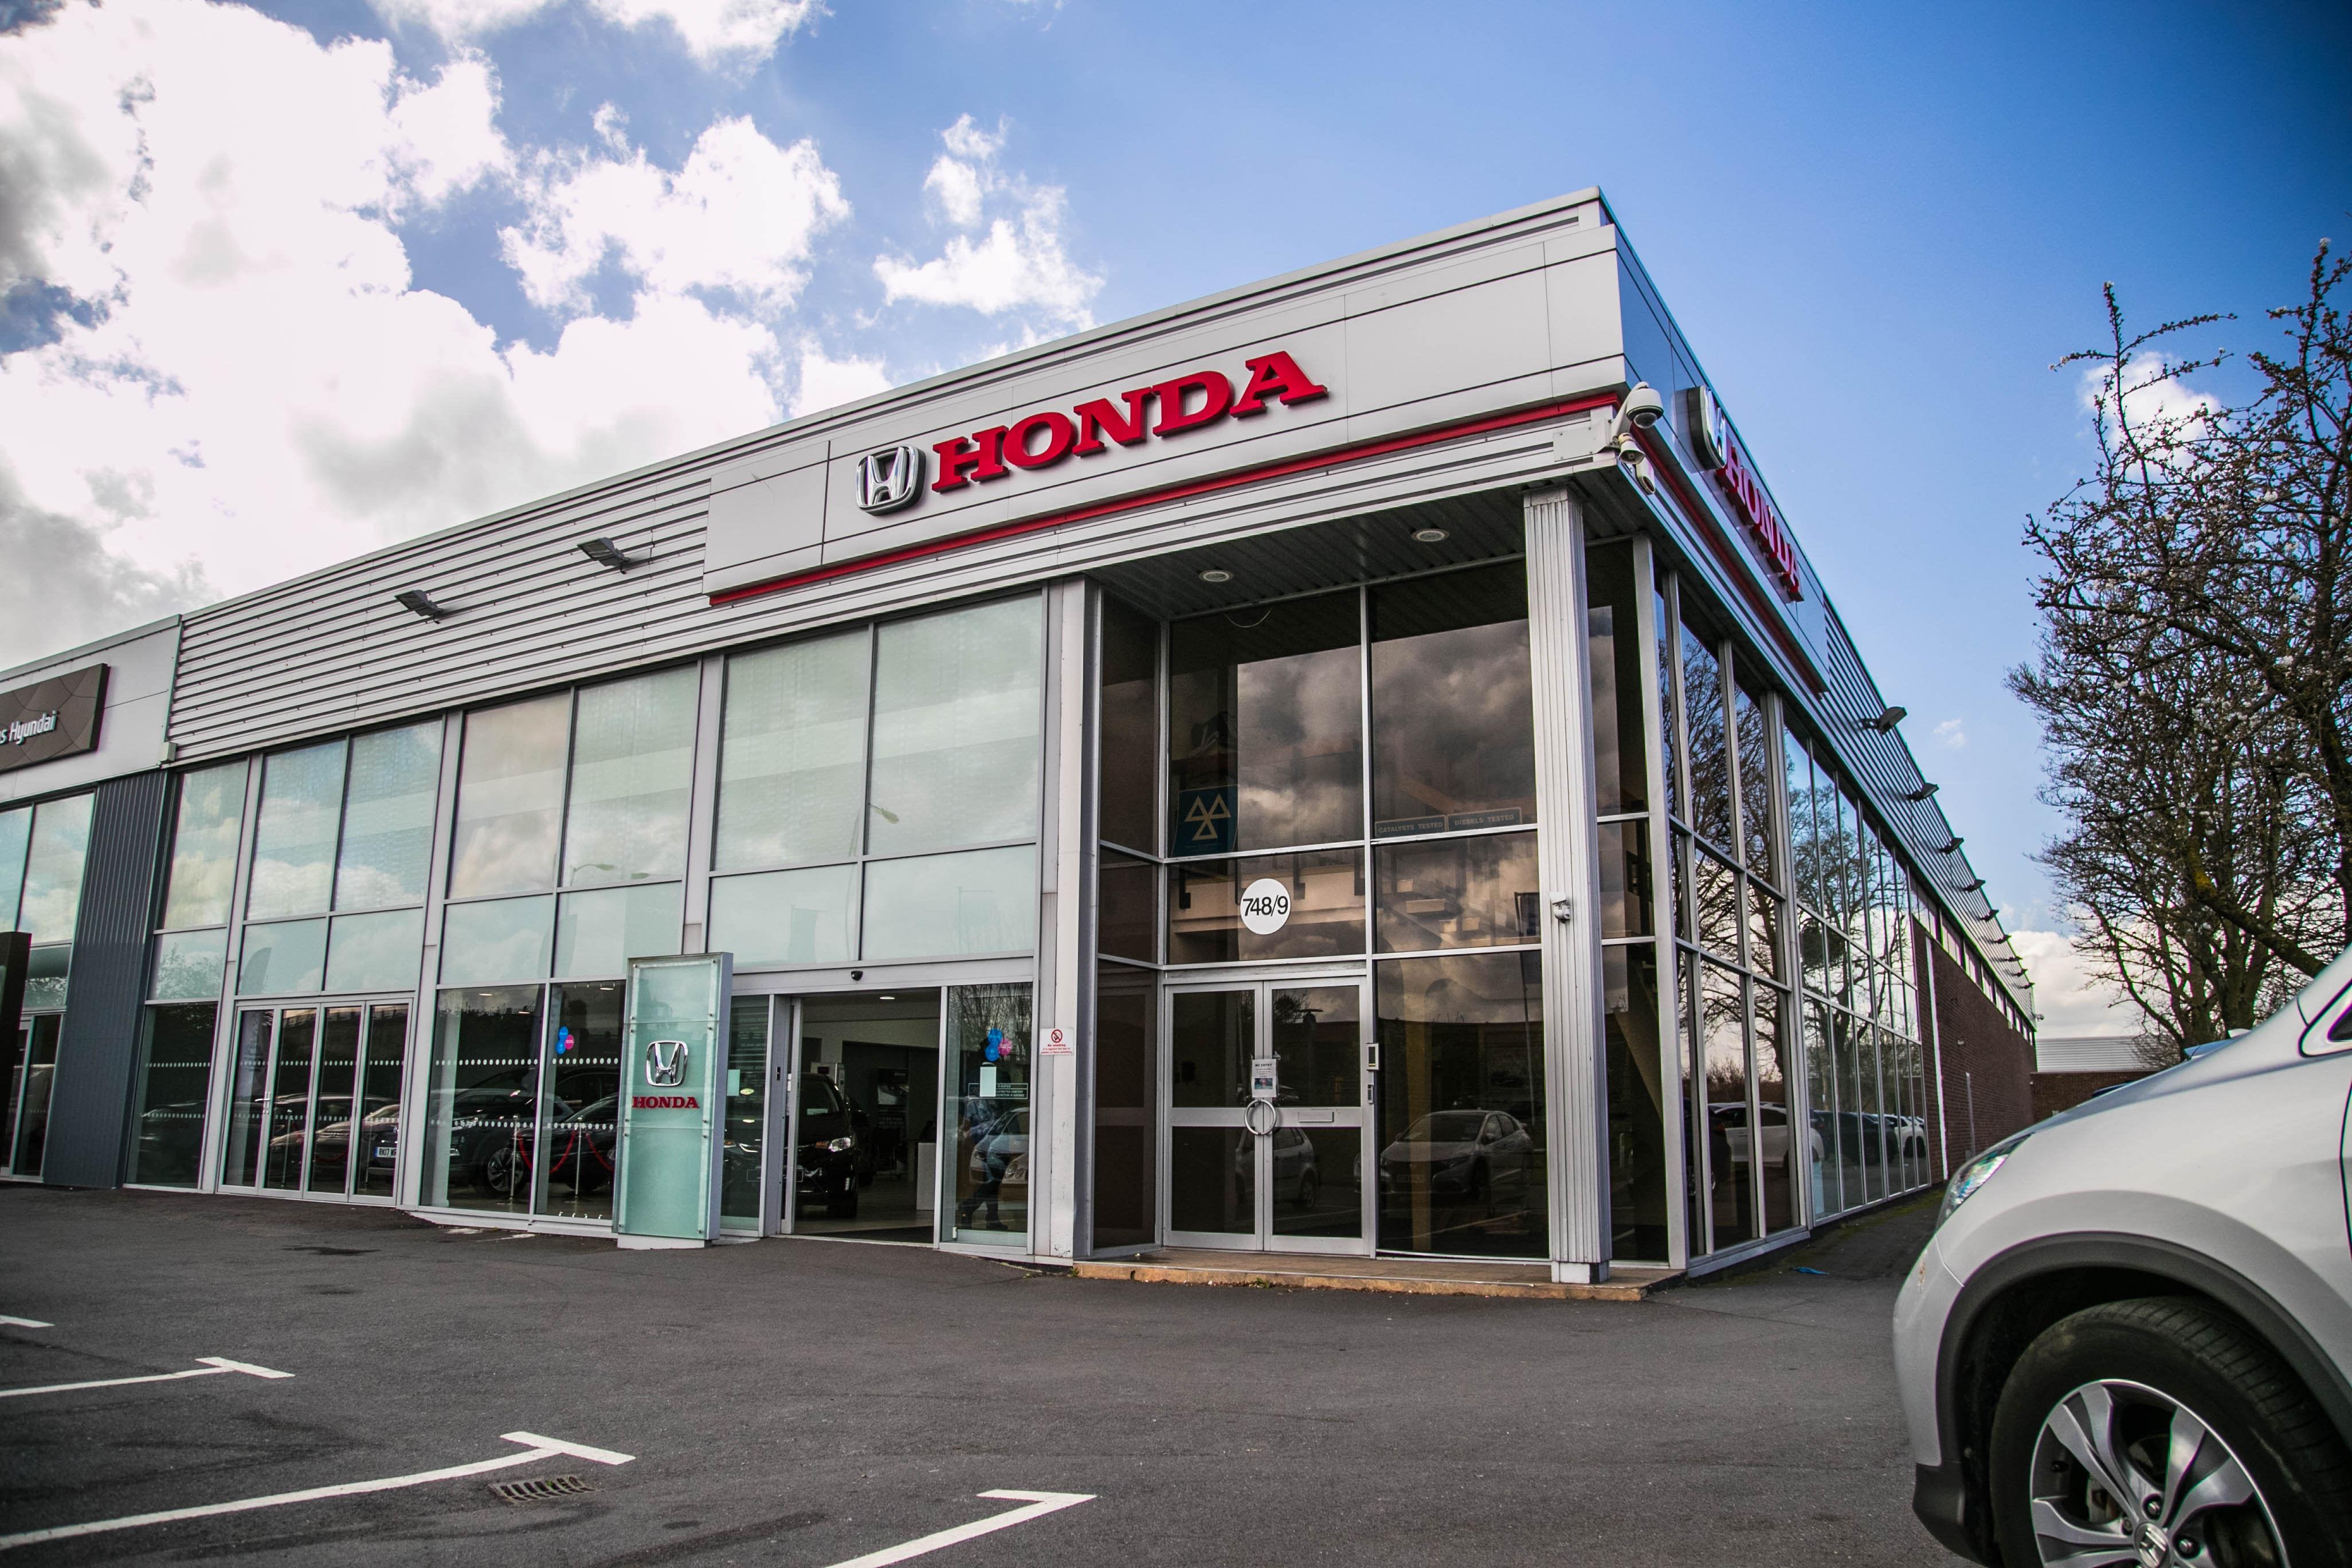 j cars for b honda sales sale motor site